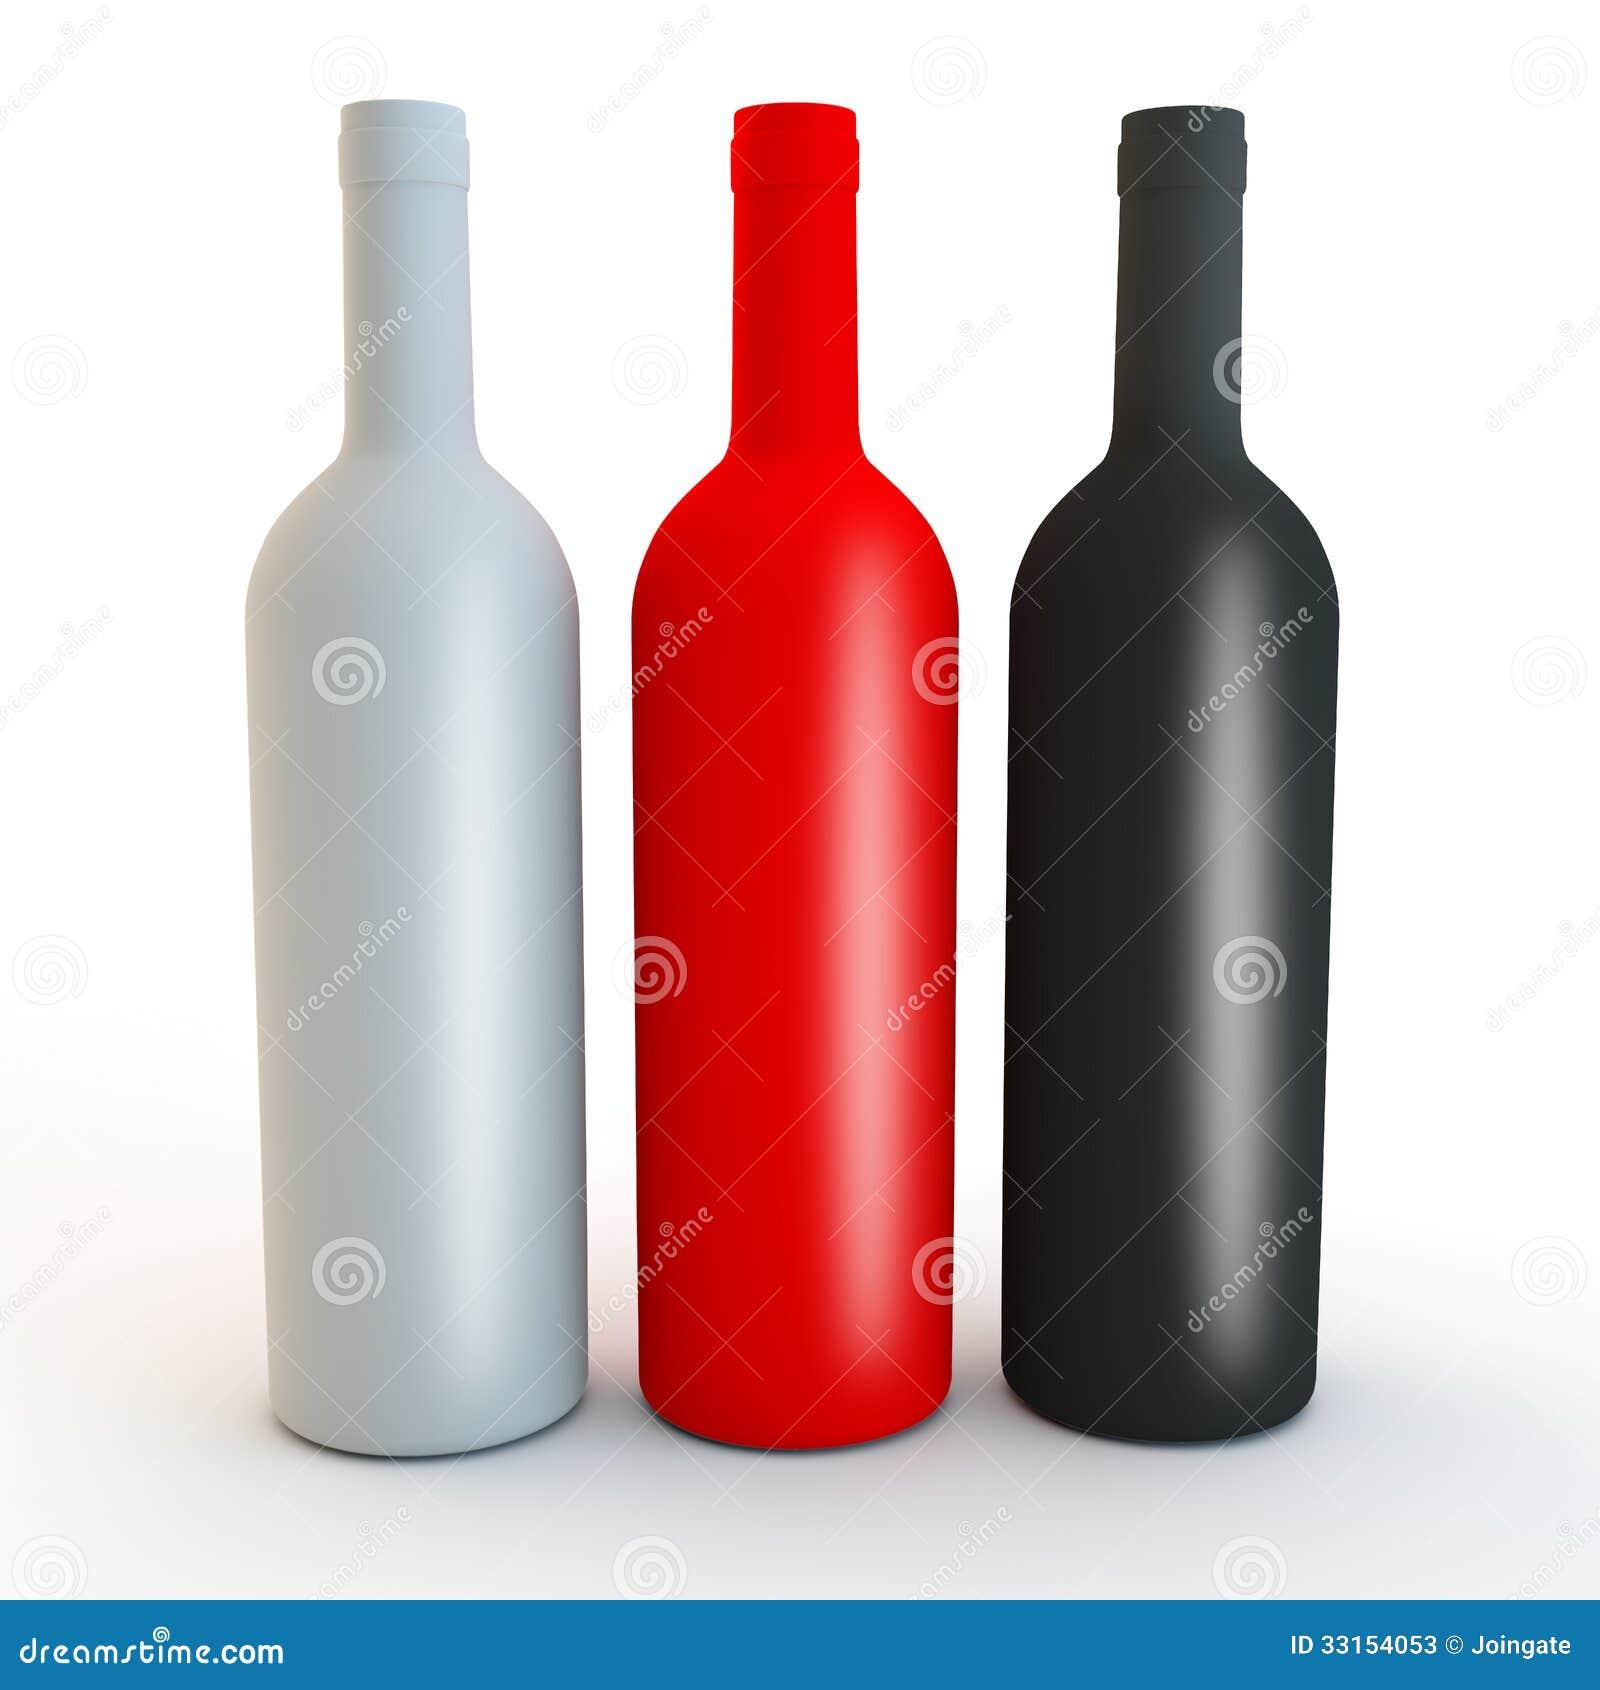 Different Coloured Matt Vodka, Spirits Or Wine Bottle Shapes